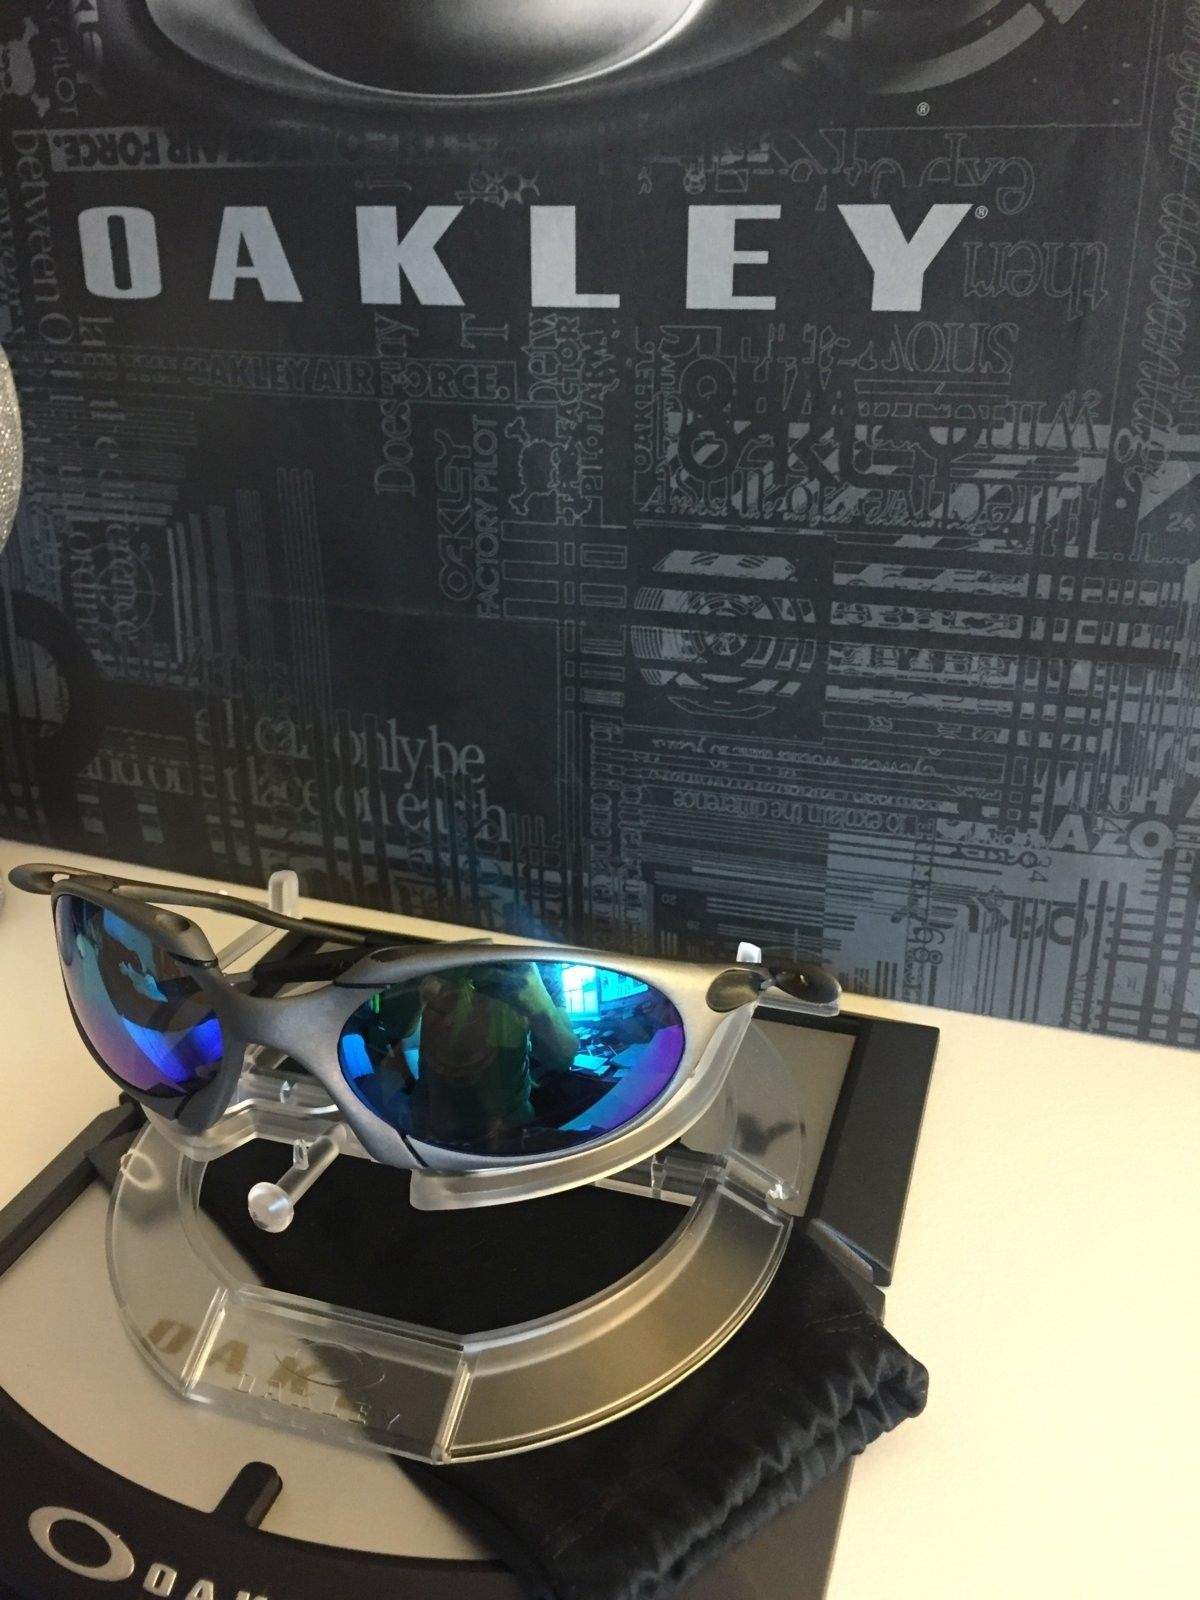 OAKLEY ROMEO 1 X METAL - IMG_4360.JPG